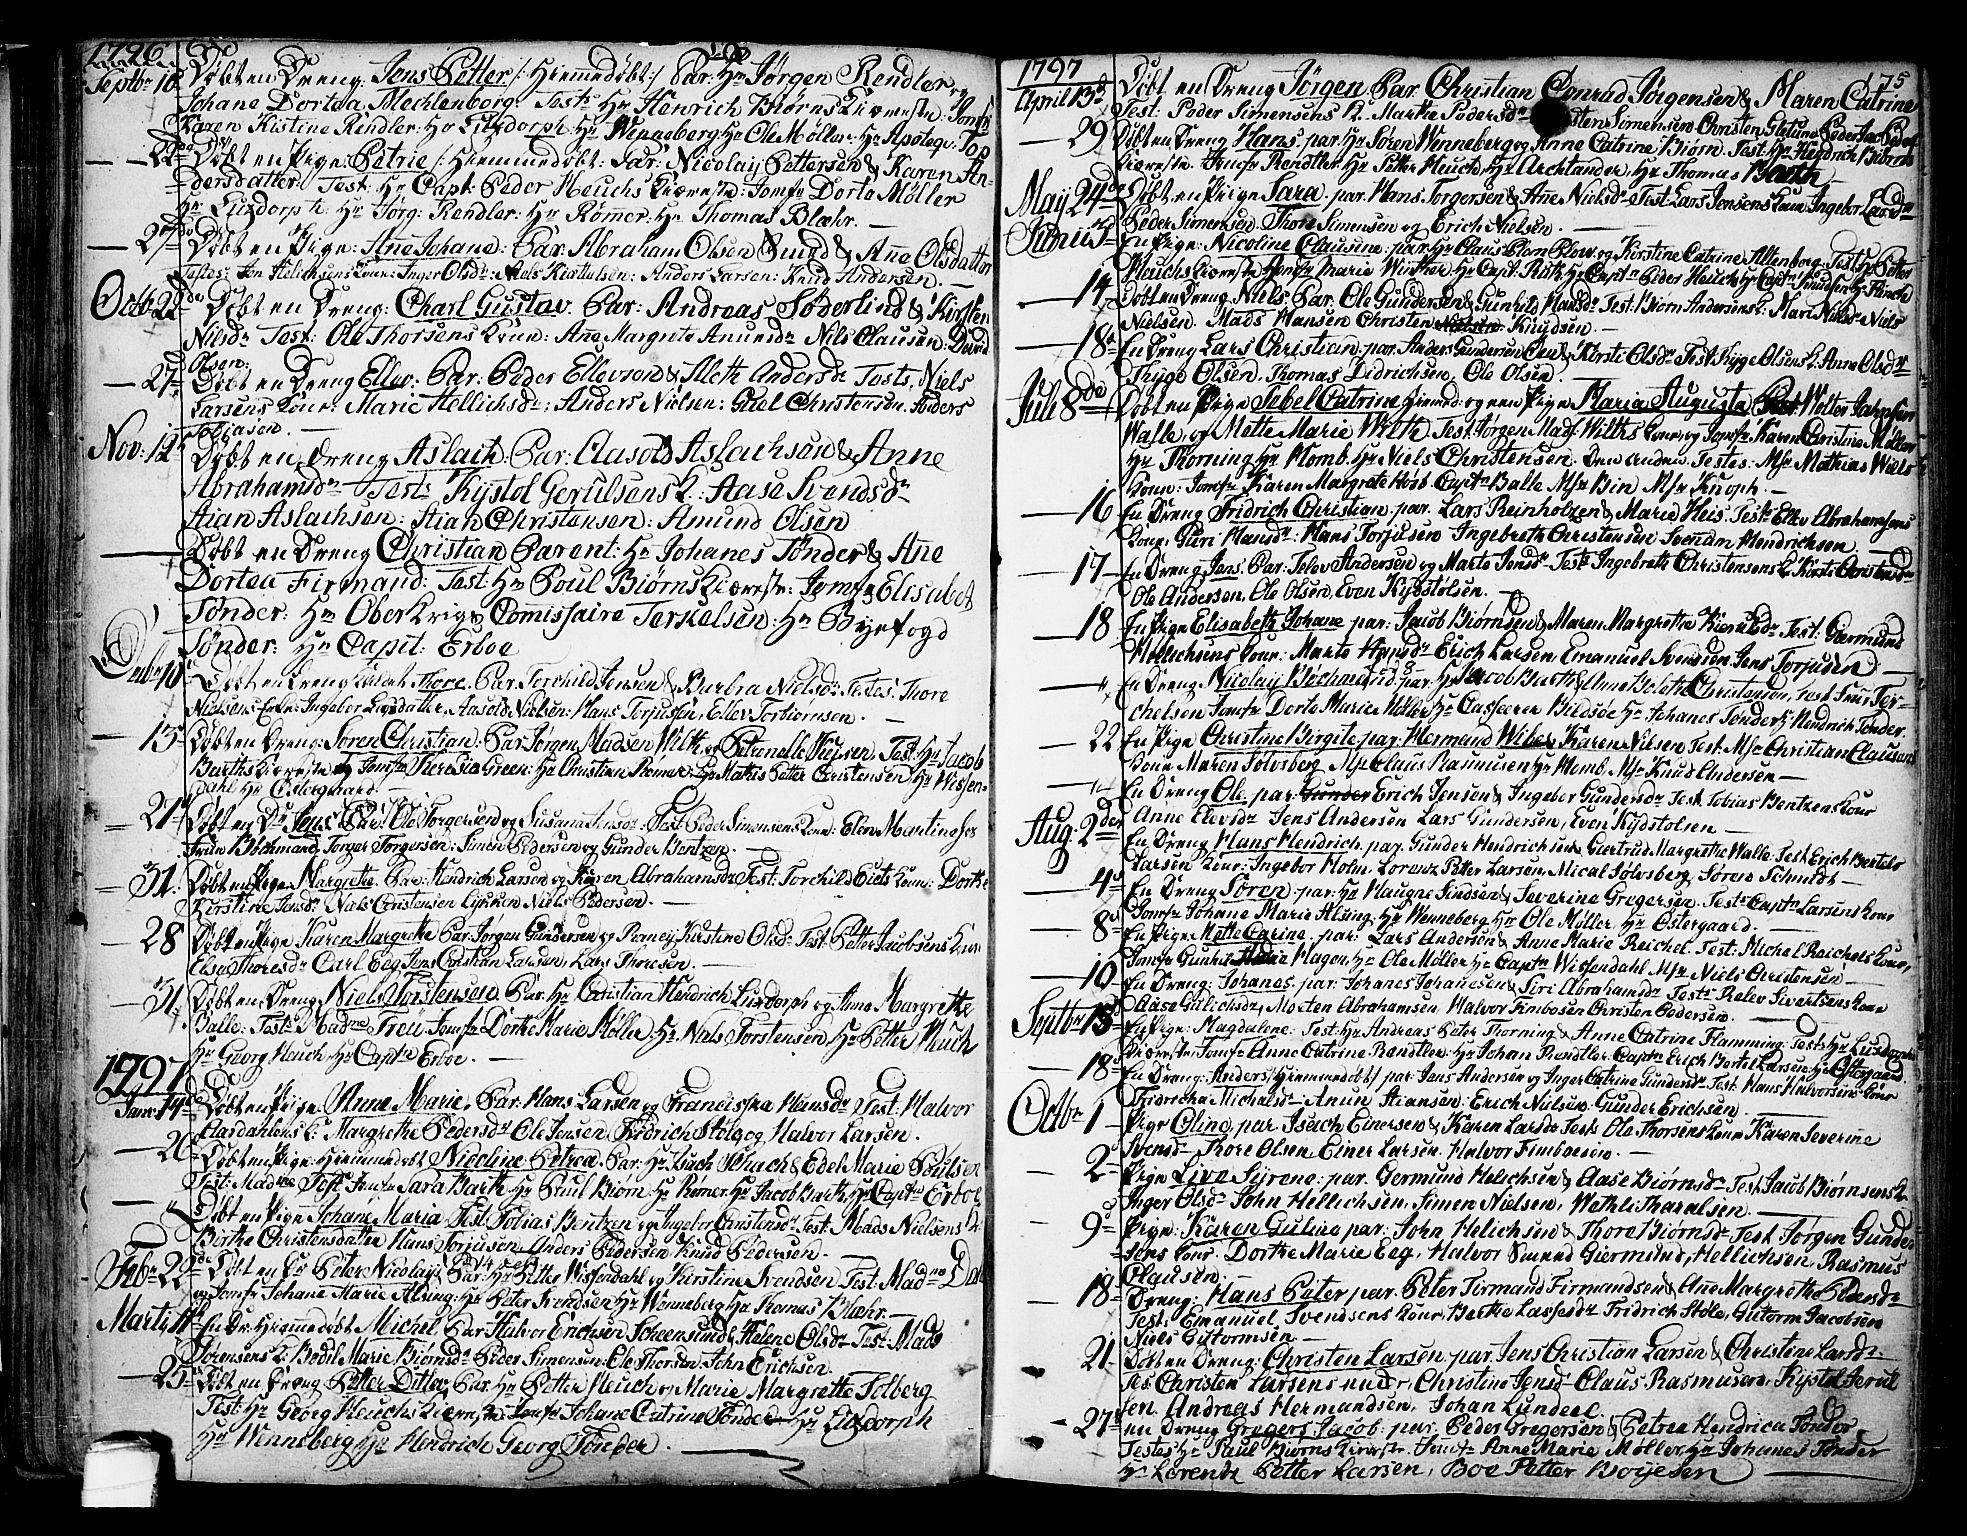 SAKO, Kragerø kirkebøker, F/Fa/L0002: Ministerialbok nr. 2, 1767-1802, s. 75